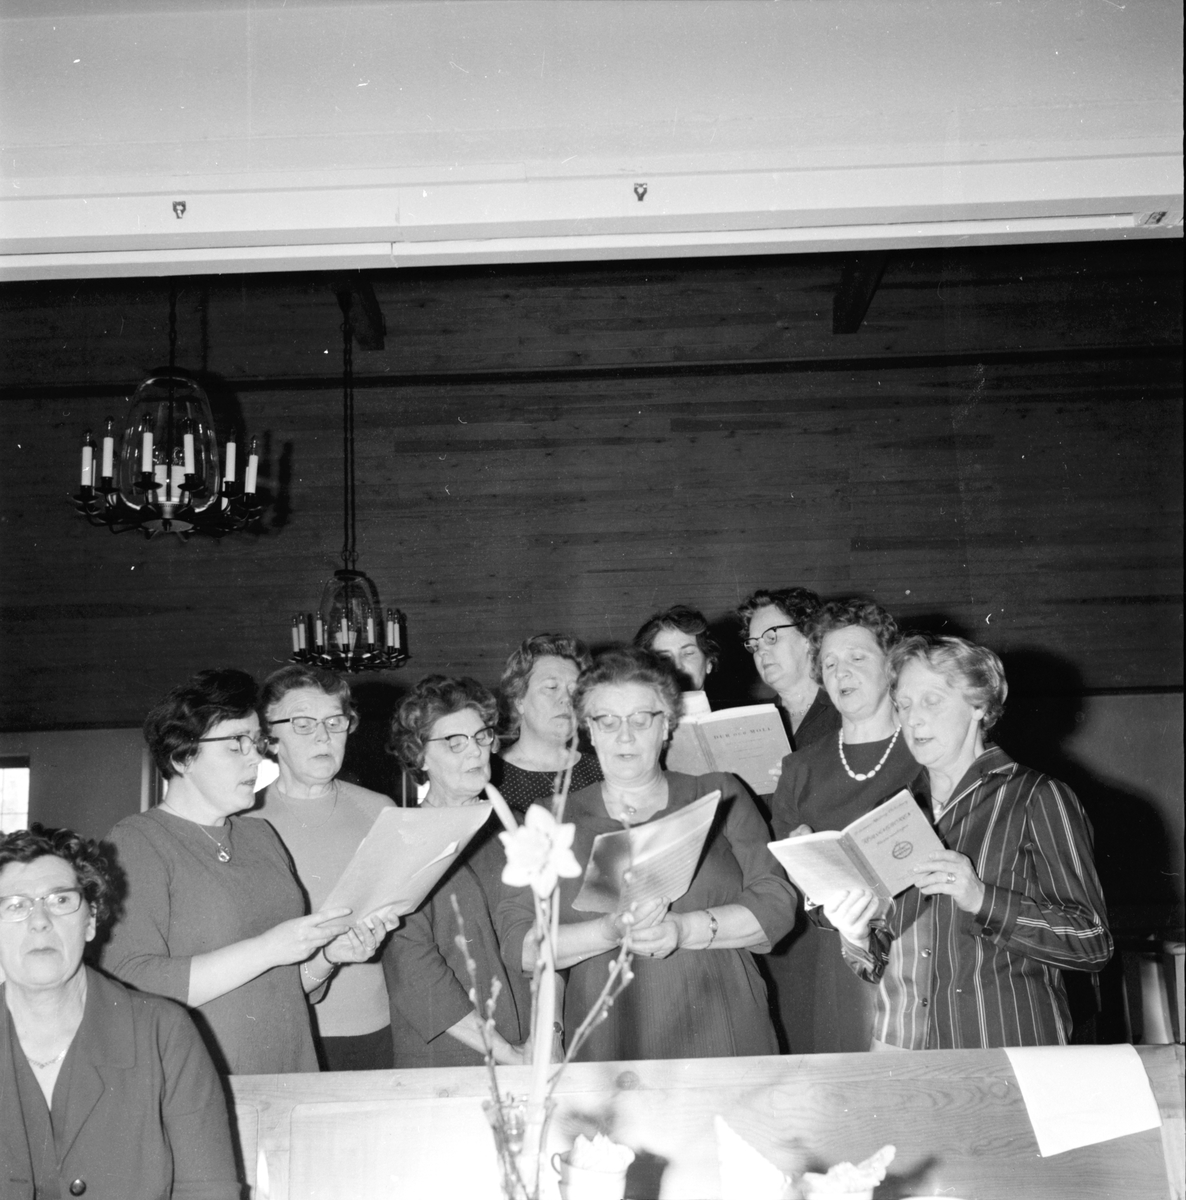 Vallviks kyrksal, Syföreningsmöte, 23 Februari 1965